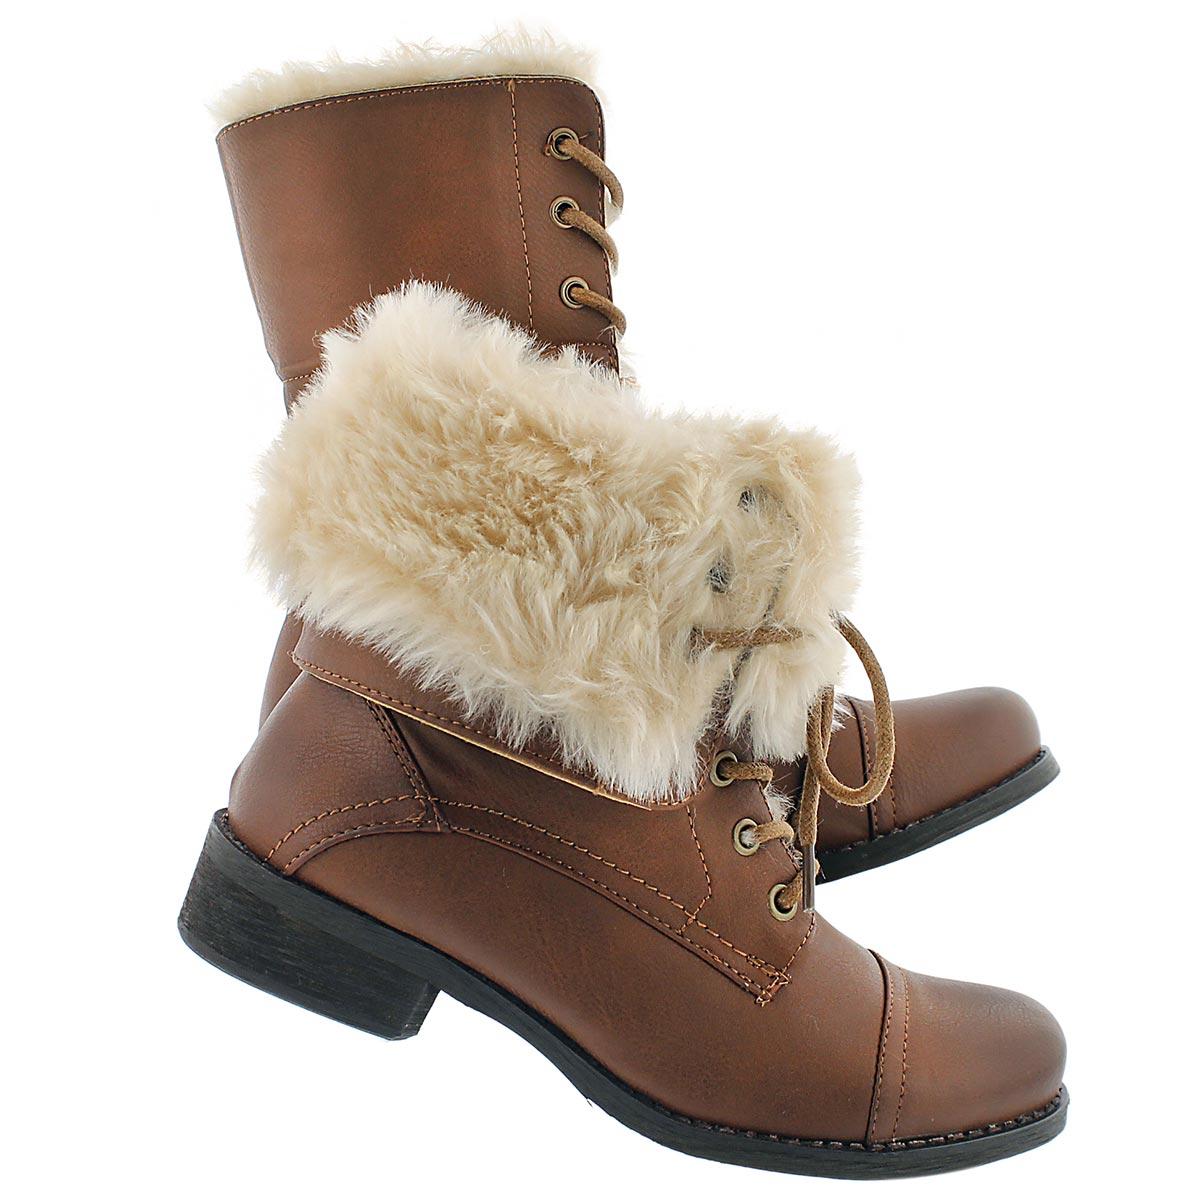 Lds Brandi 2 rust lace up combat boot